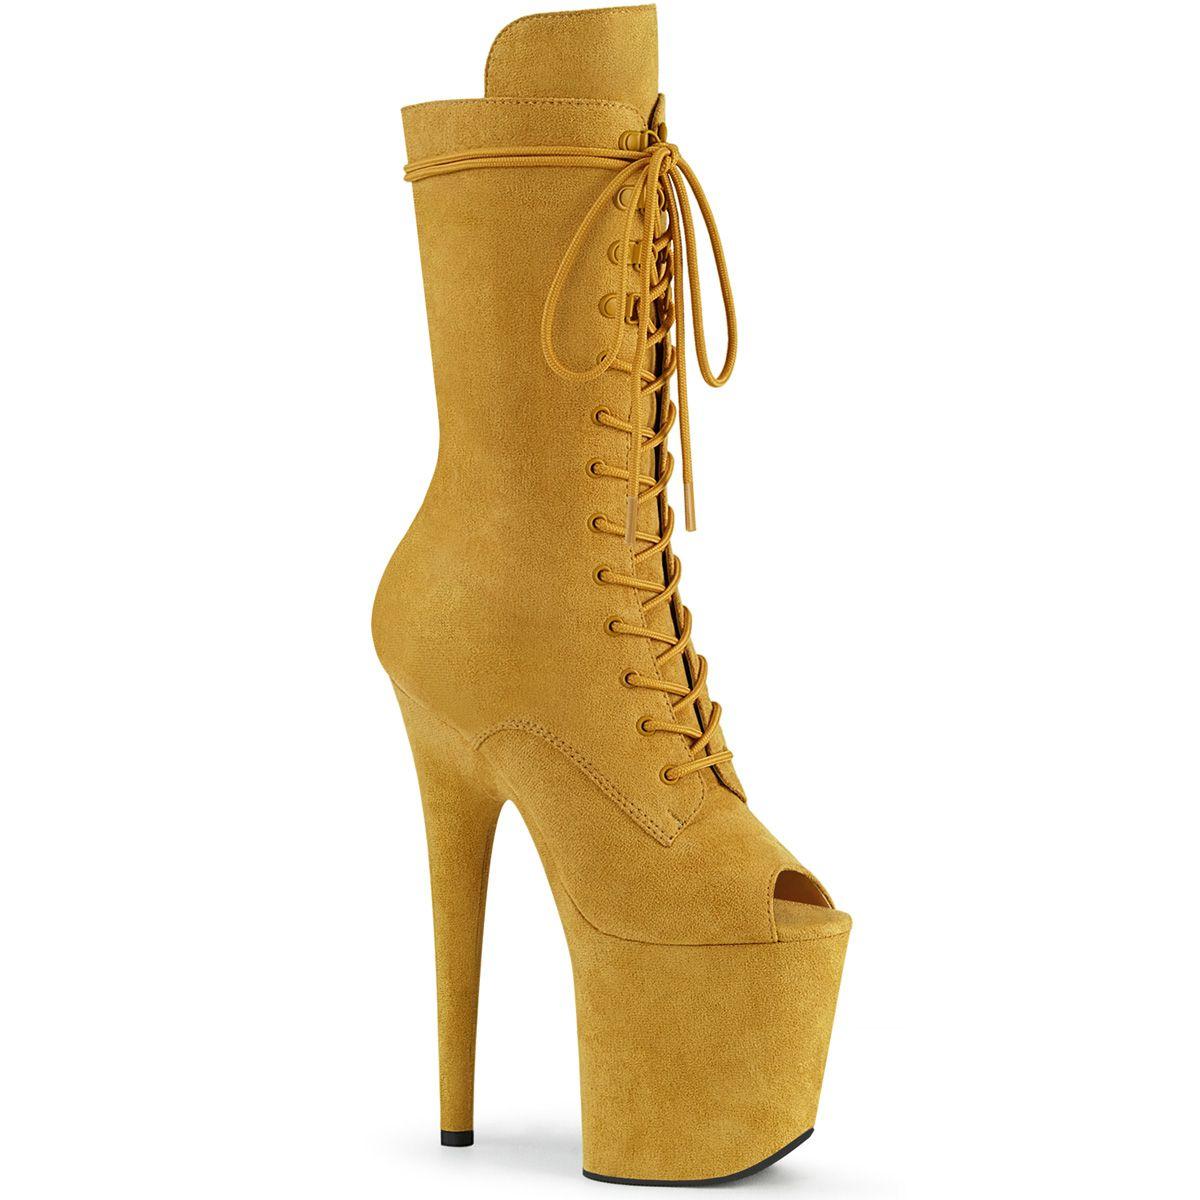 Bota Flamingo 1051 FS Veludo Peep Toe Ankle Boot EXT - Pleaser (encomenda)